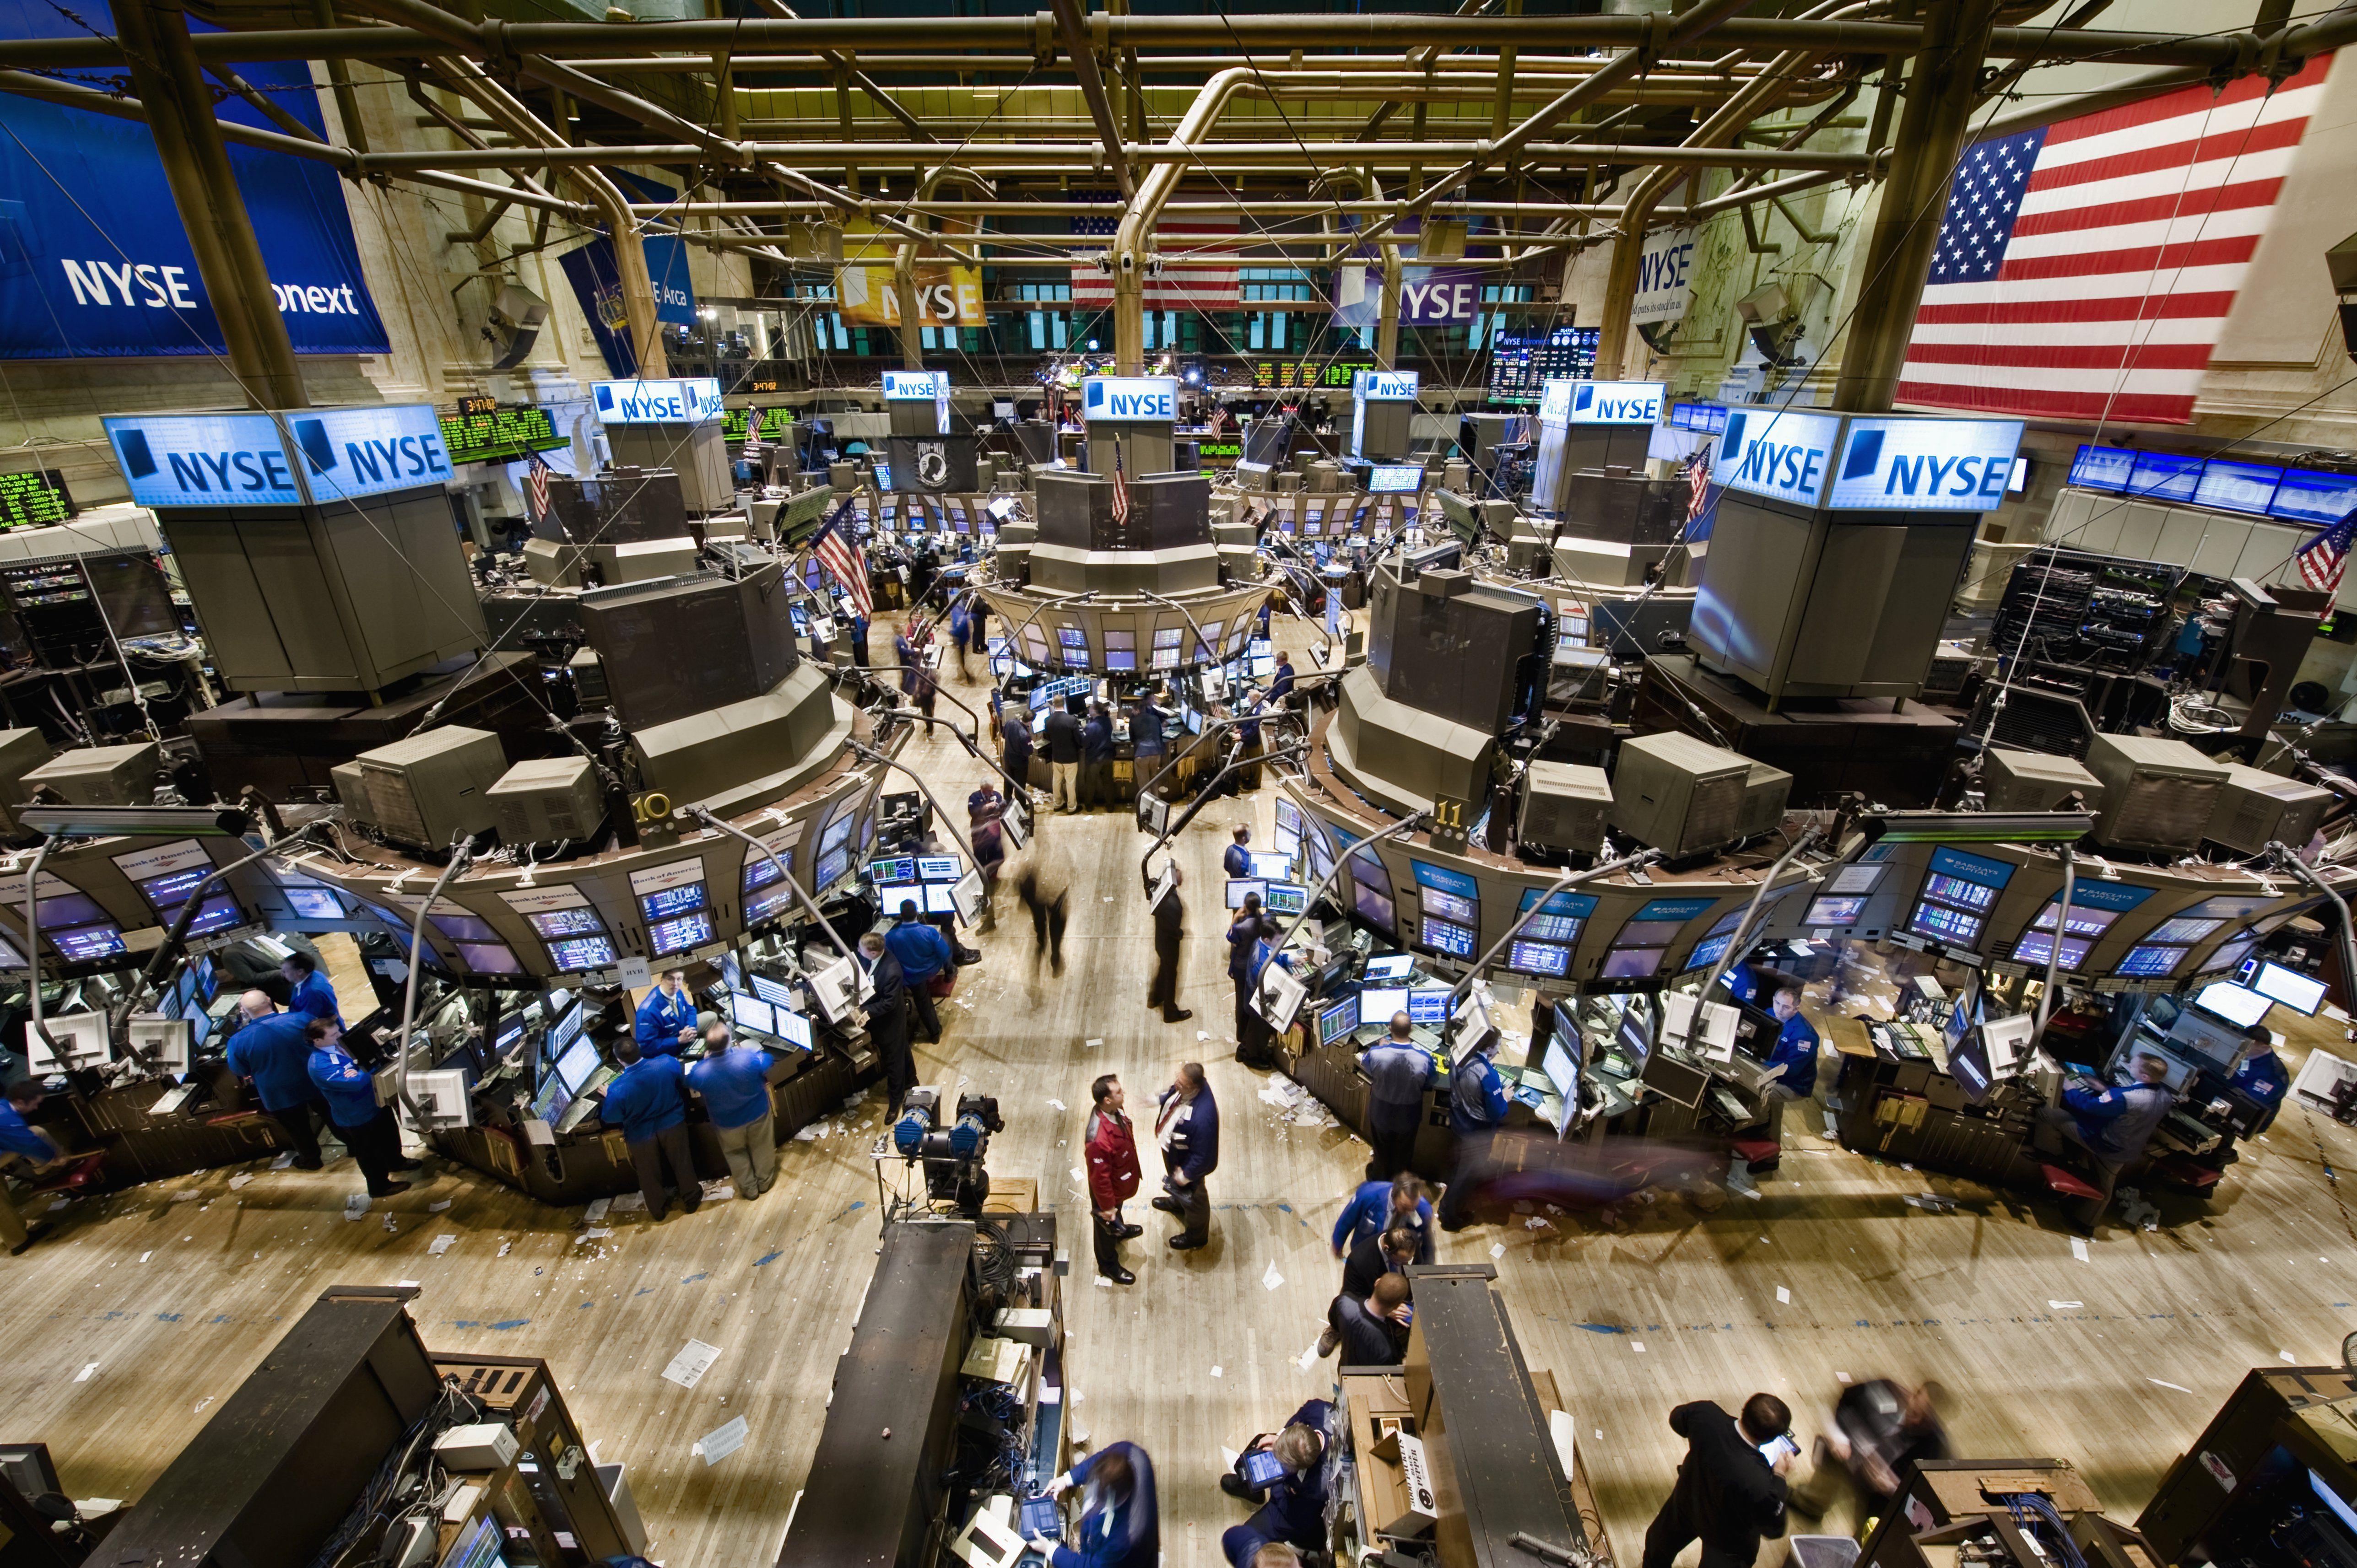 Retirement Nextadvisor With Time Stock Exchange Stock Exchange Market Plan For Life